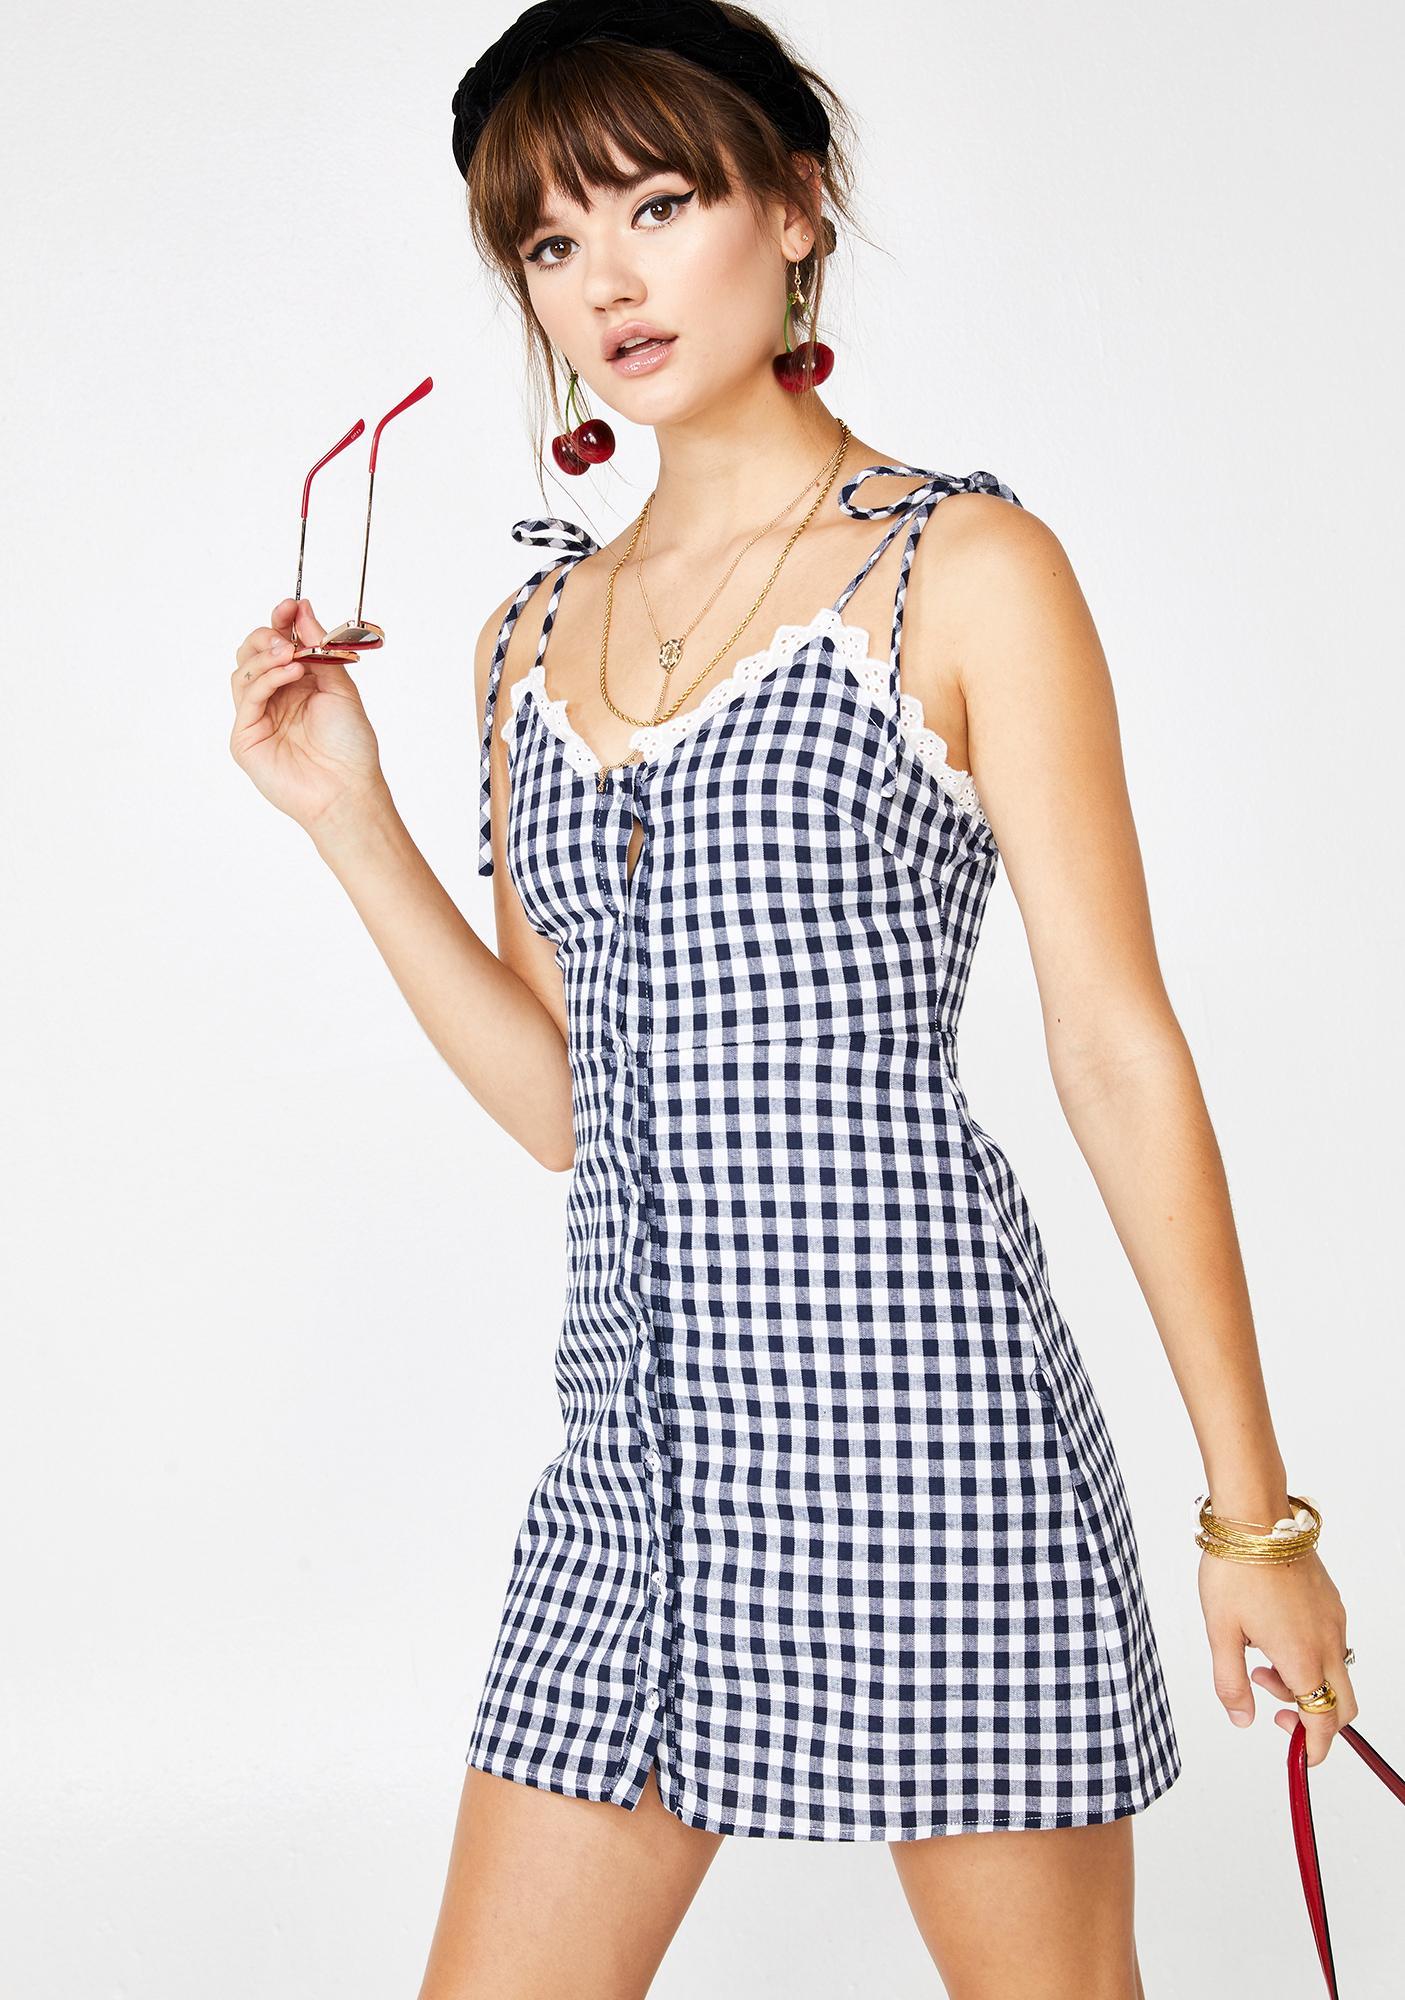 Berry Take My Digits Gingham Dress